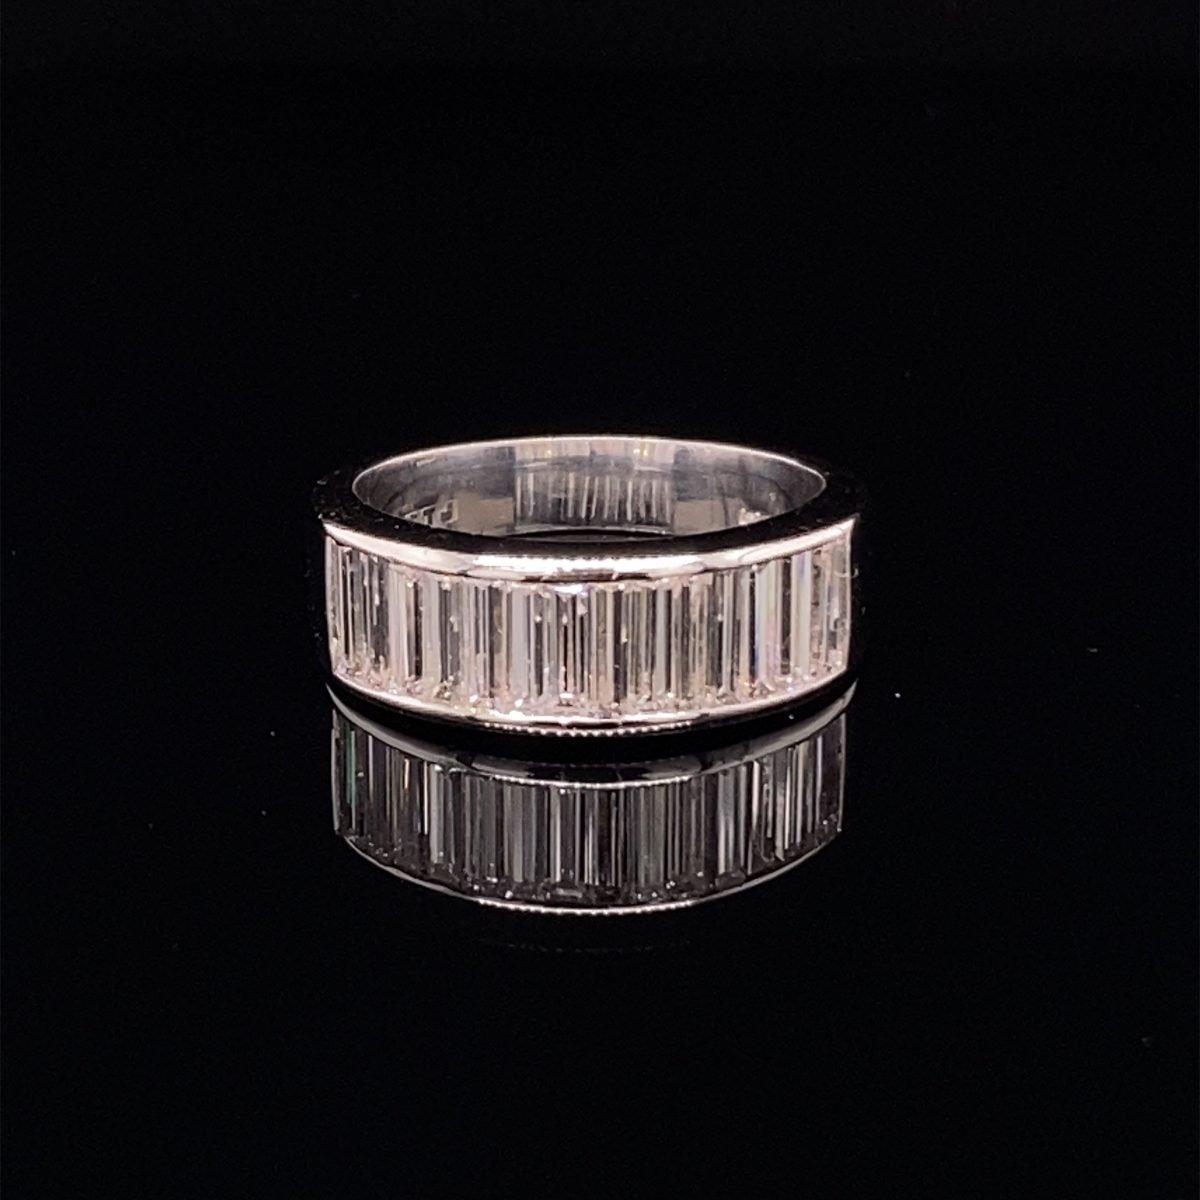 Diamond baguette cut half eternity ring